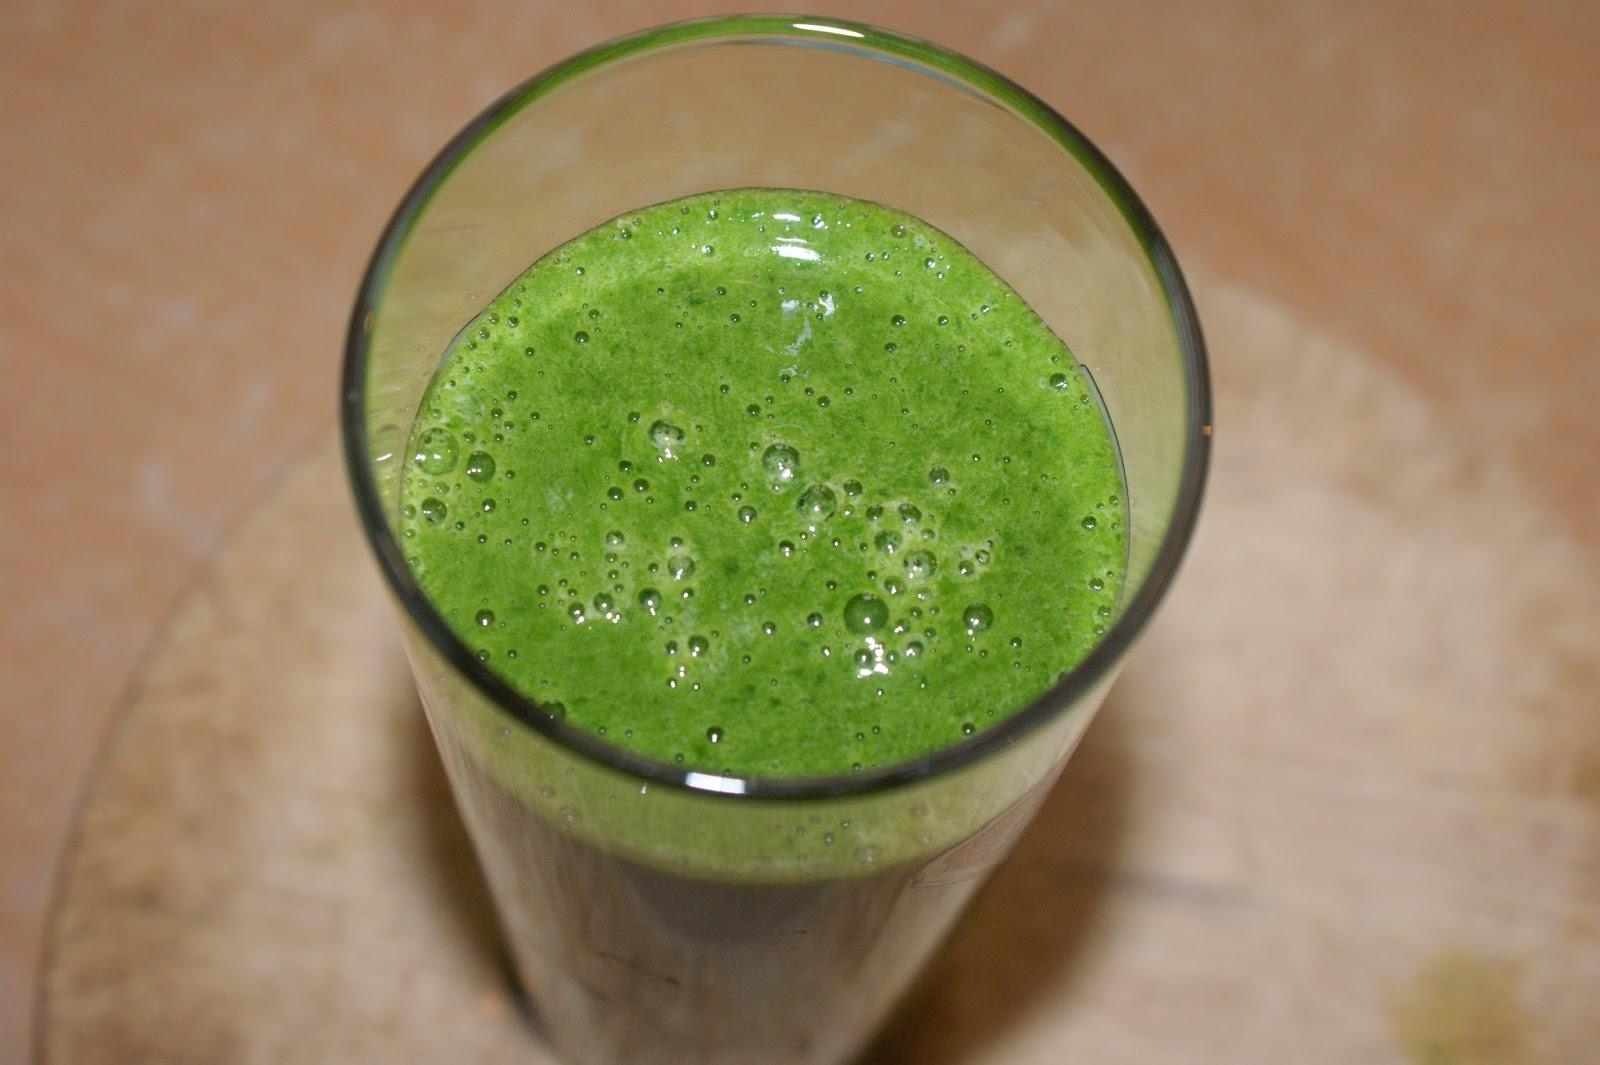 green smooethie